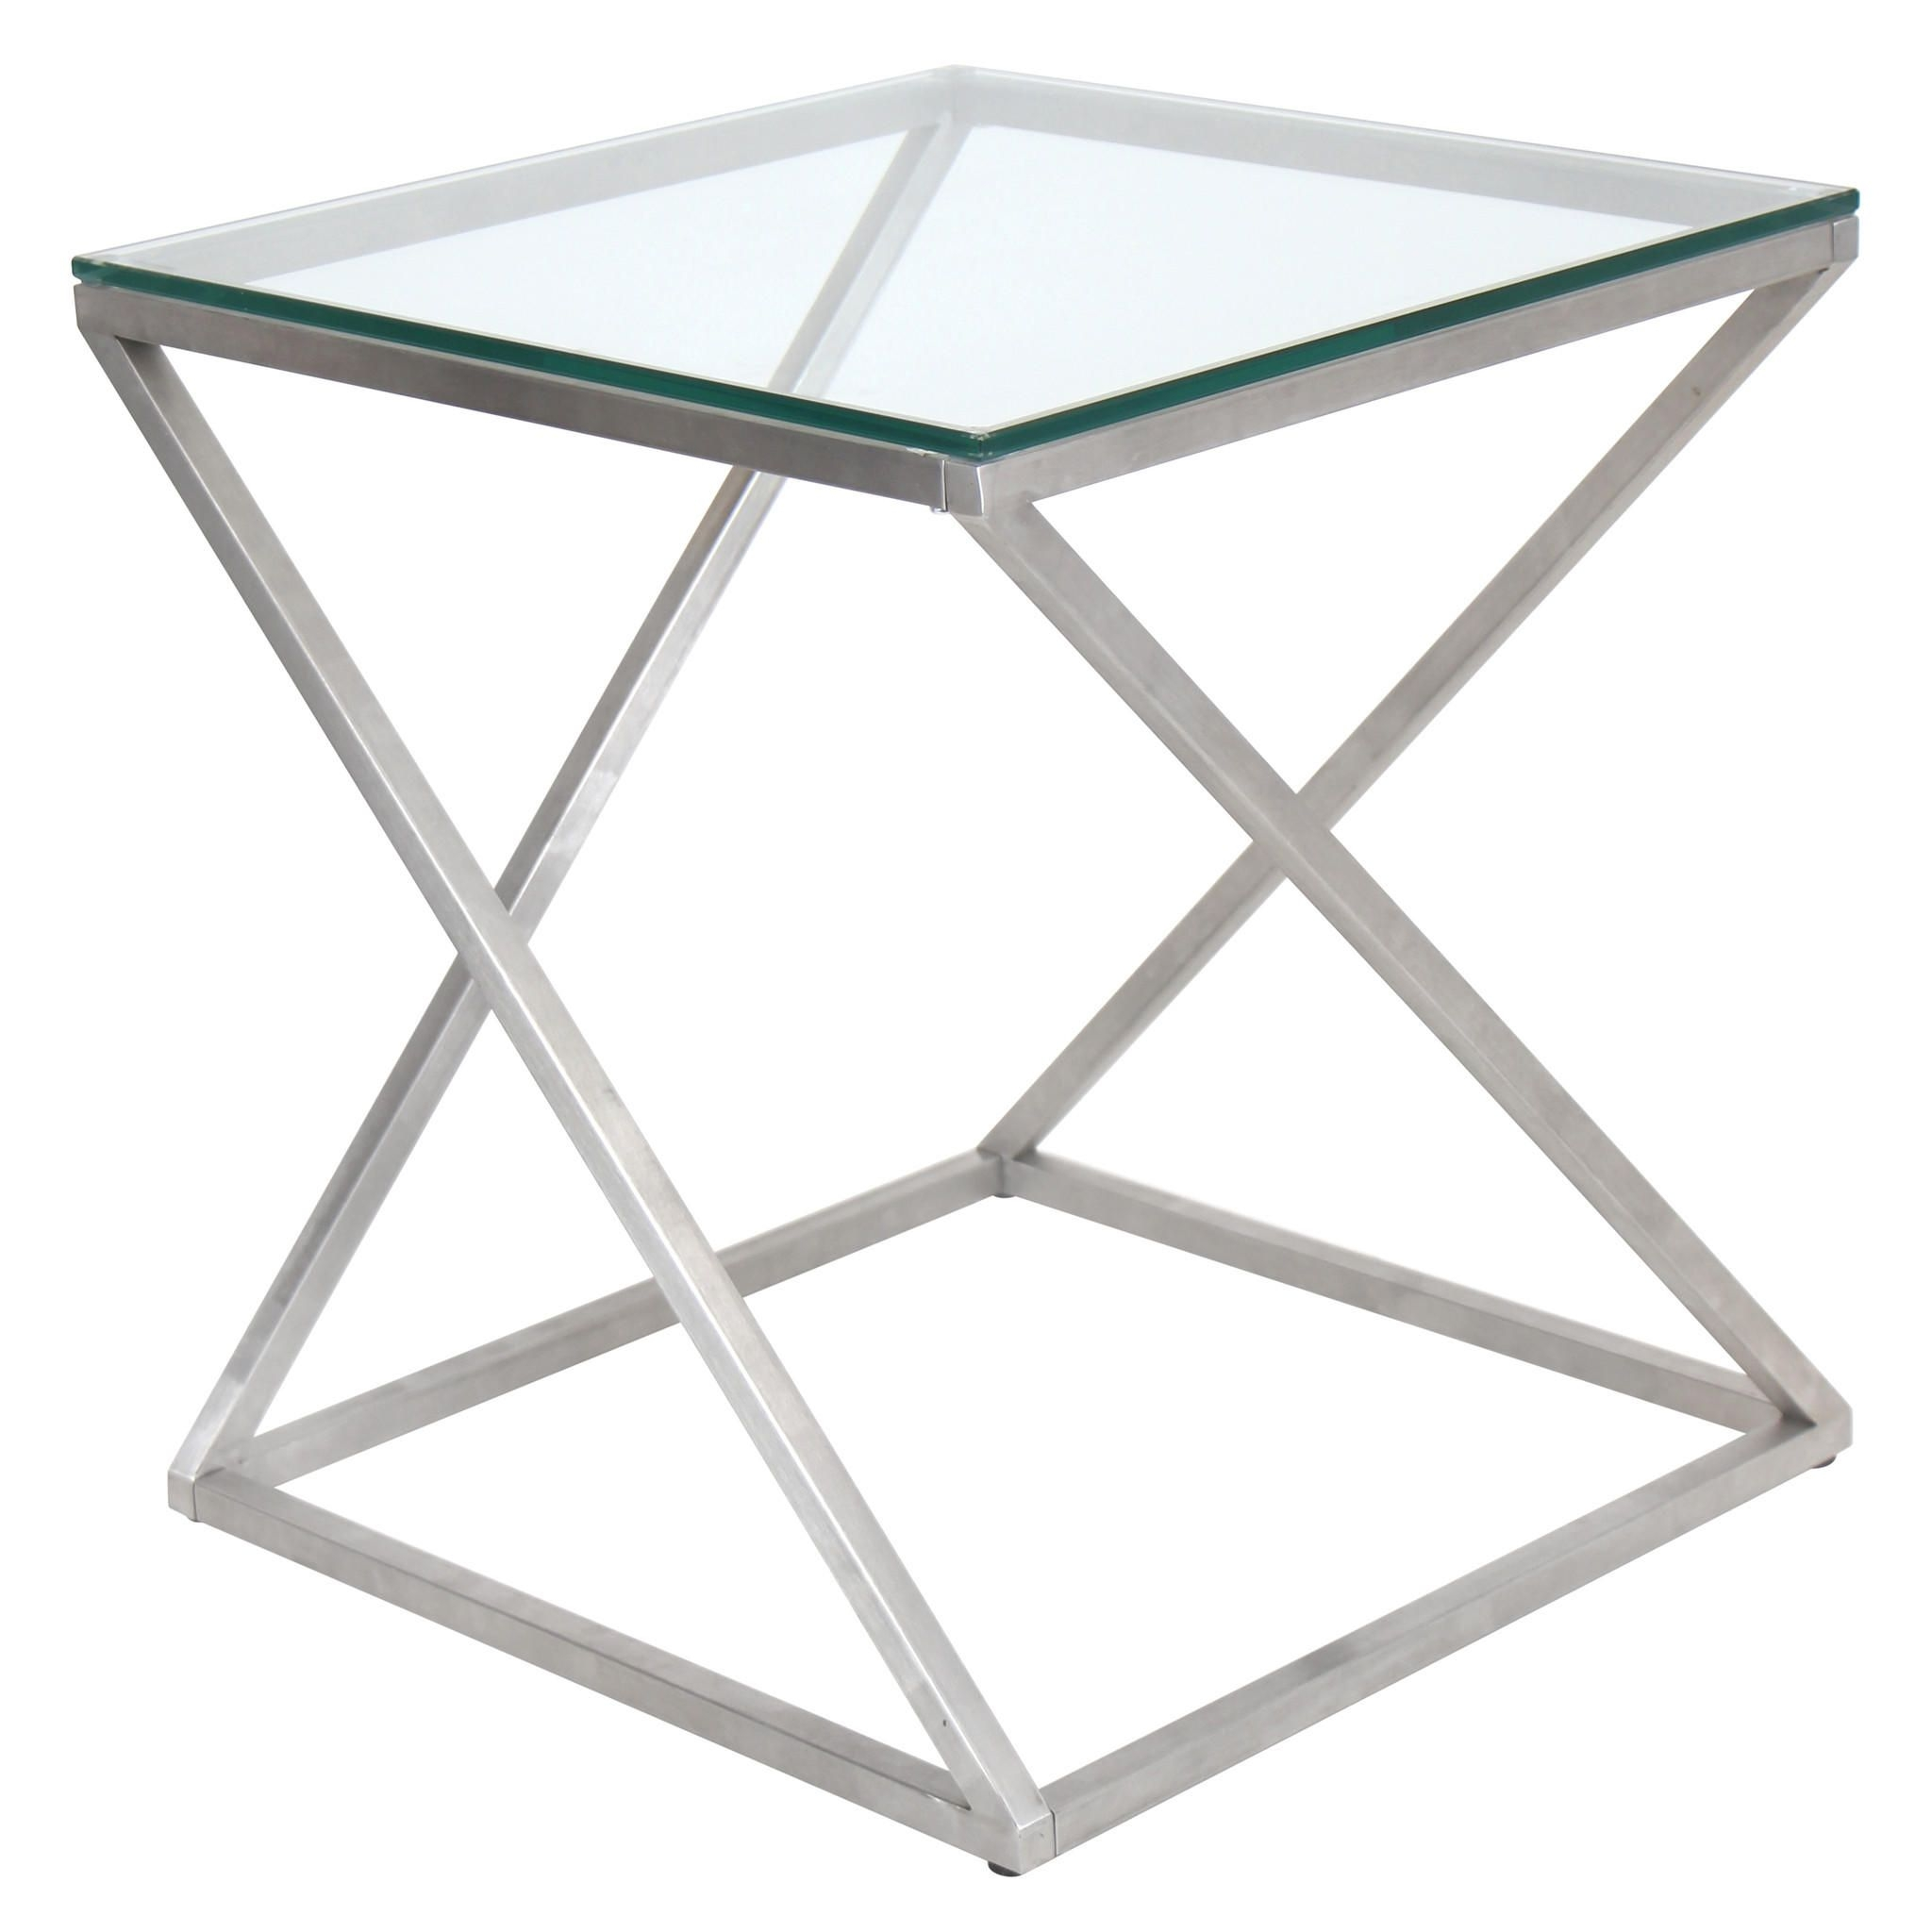 Stainless steel furniture designs Metal 4z Stainless Steel Modern End Table Luxmi Enterprises Palampur Stainless Steel Stainless Steel Furniture Ideas On Foter